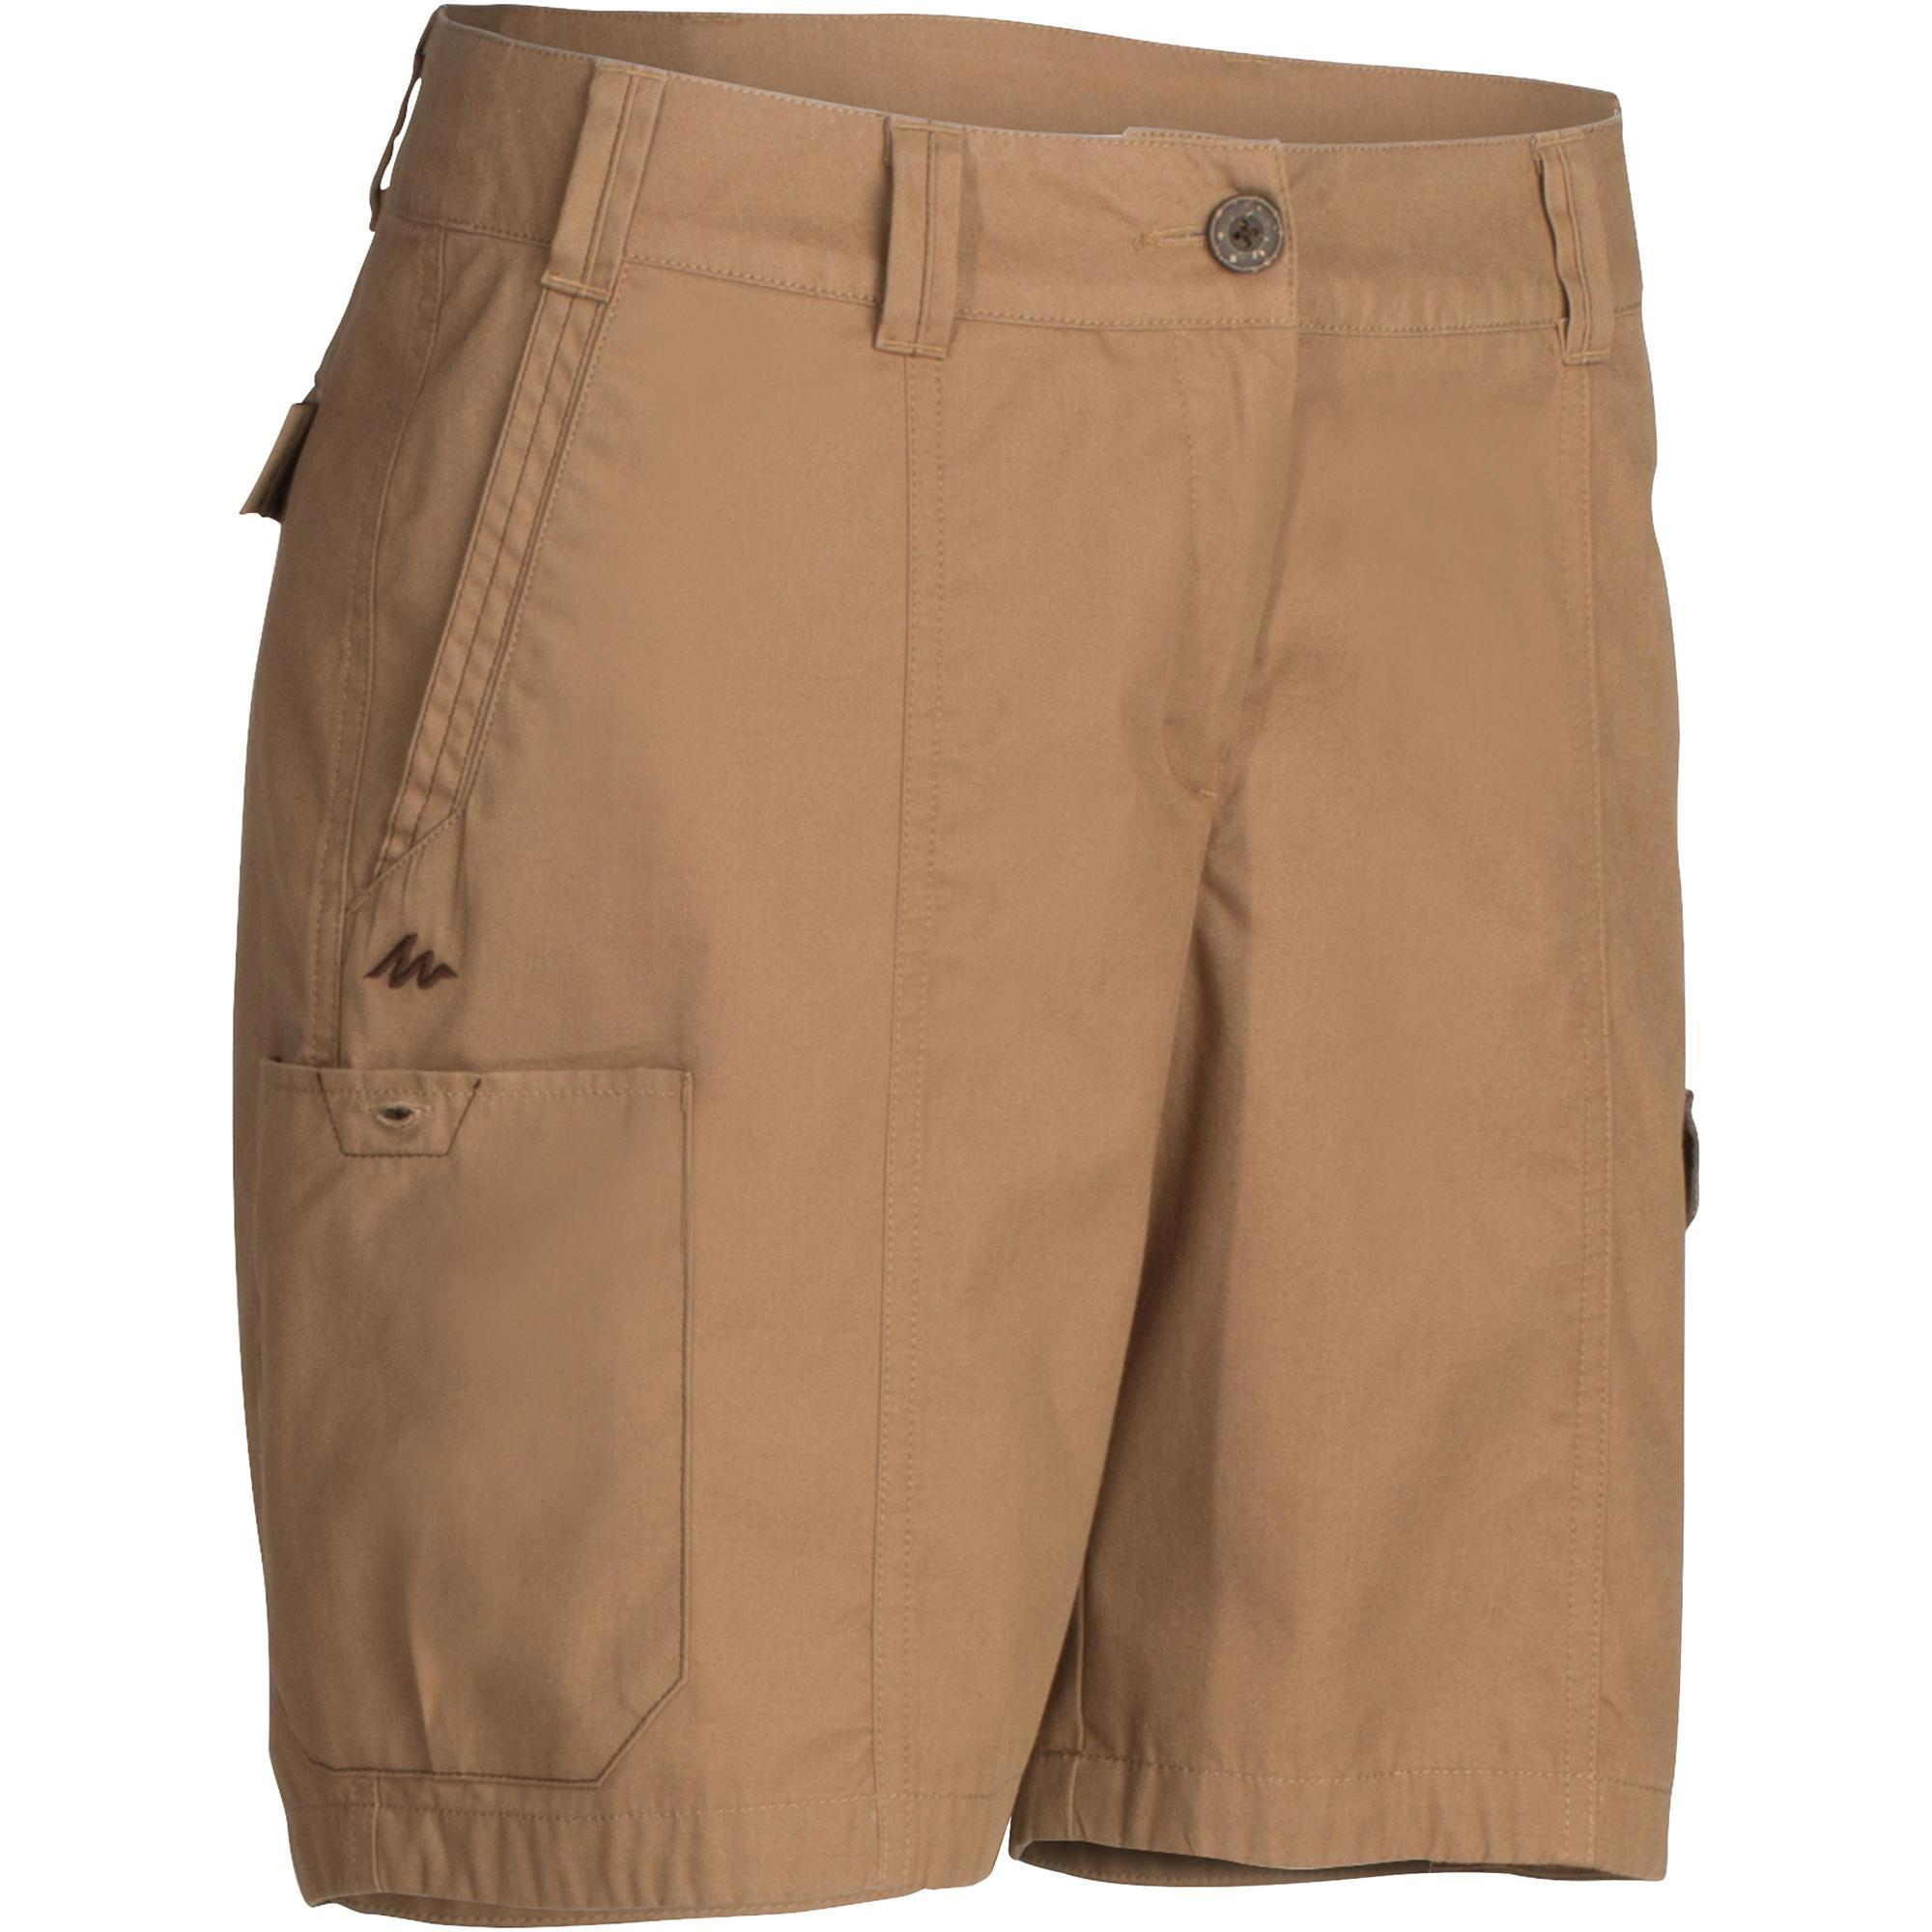 097e2c14d12e Comprar Pantalones cortos de Mujer online | Decathlon